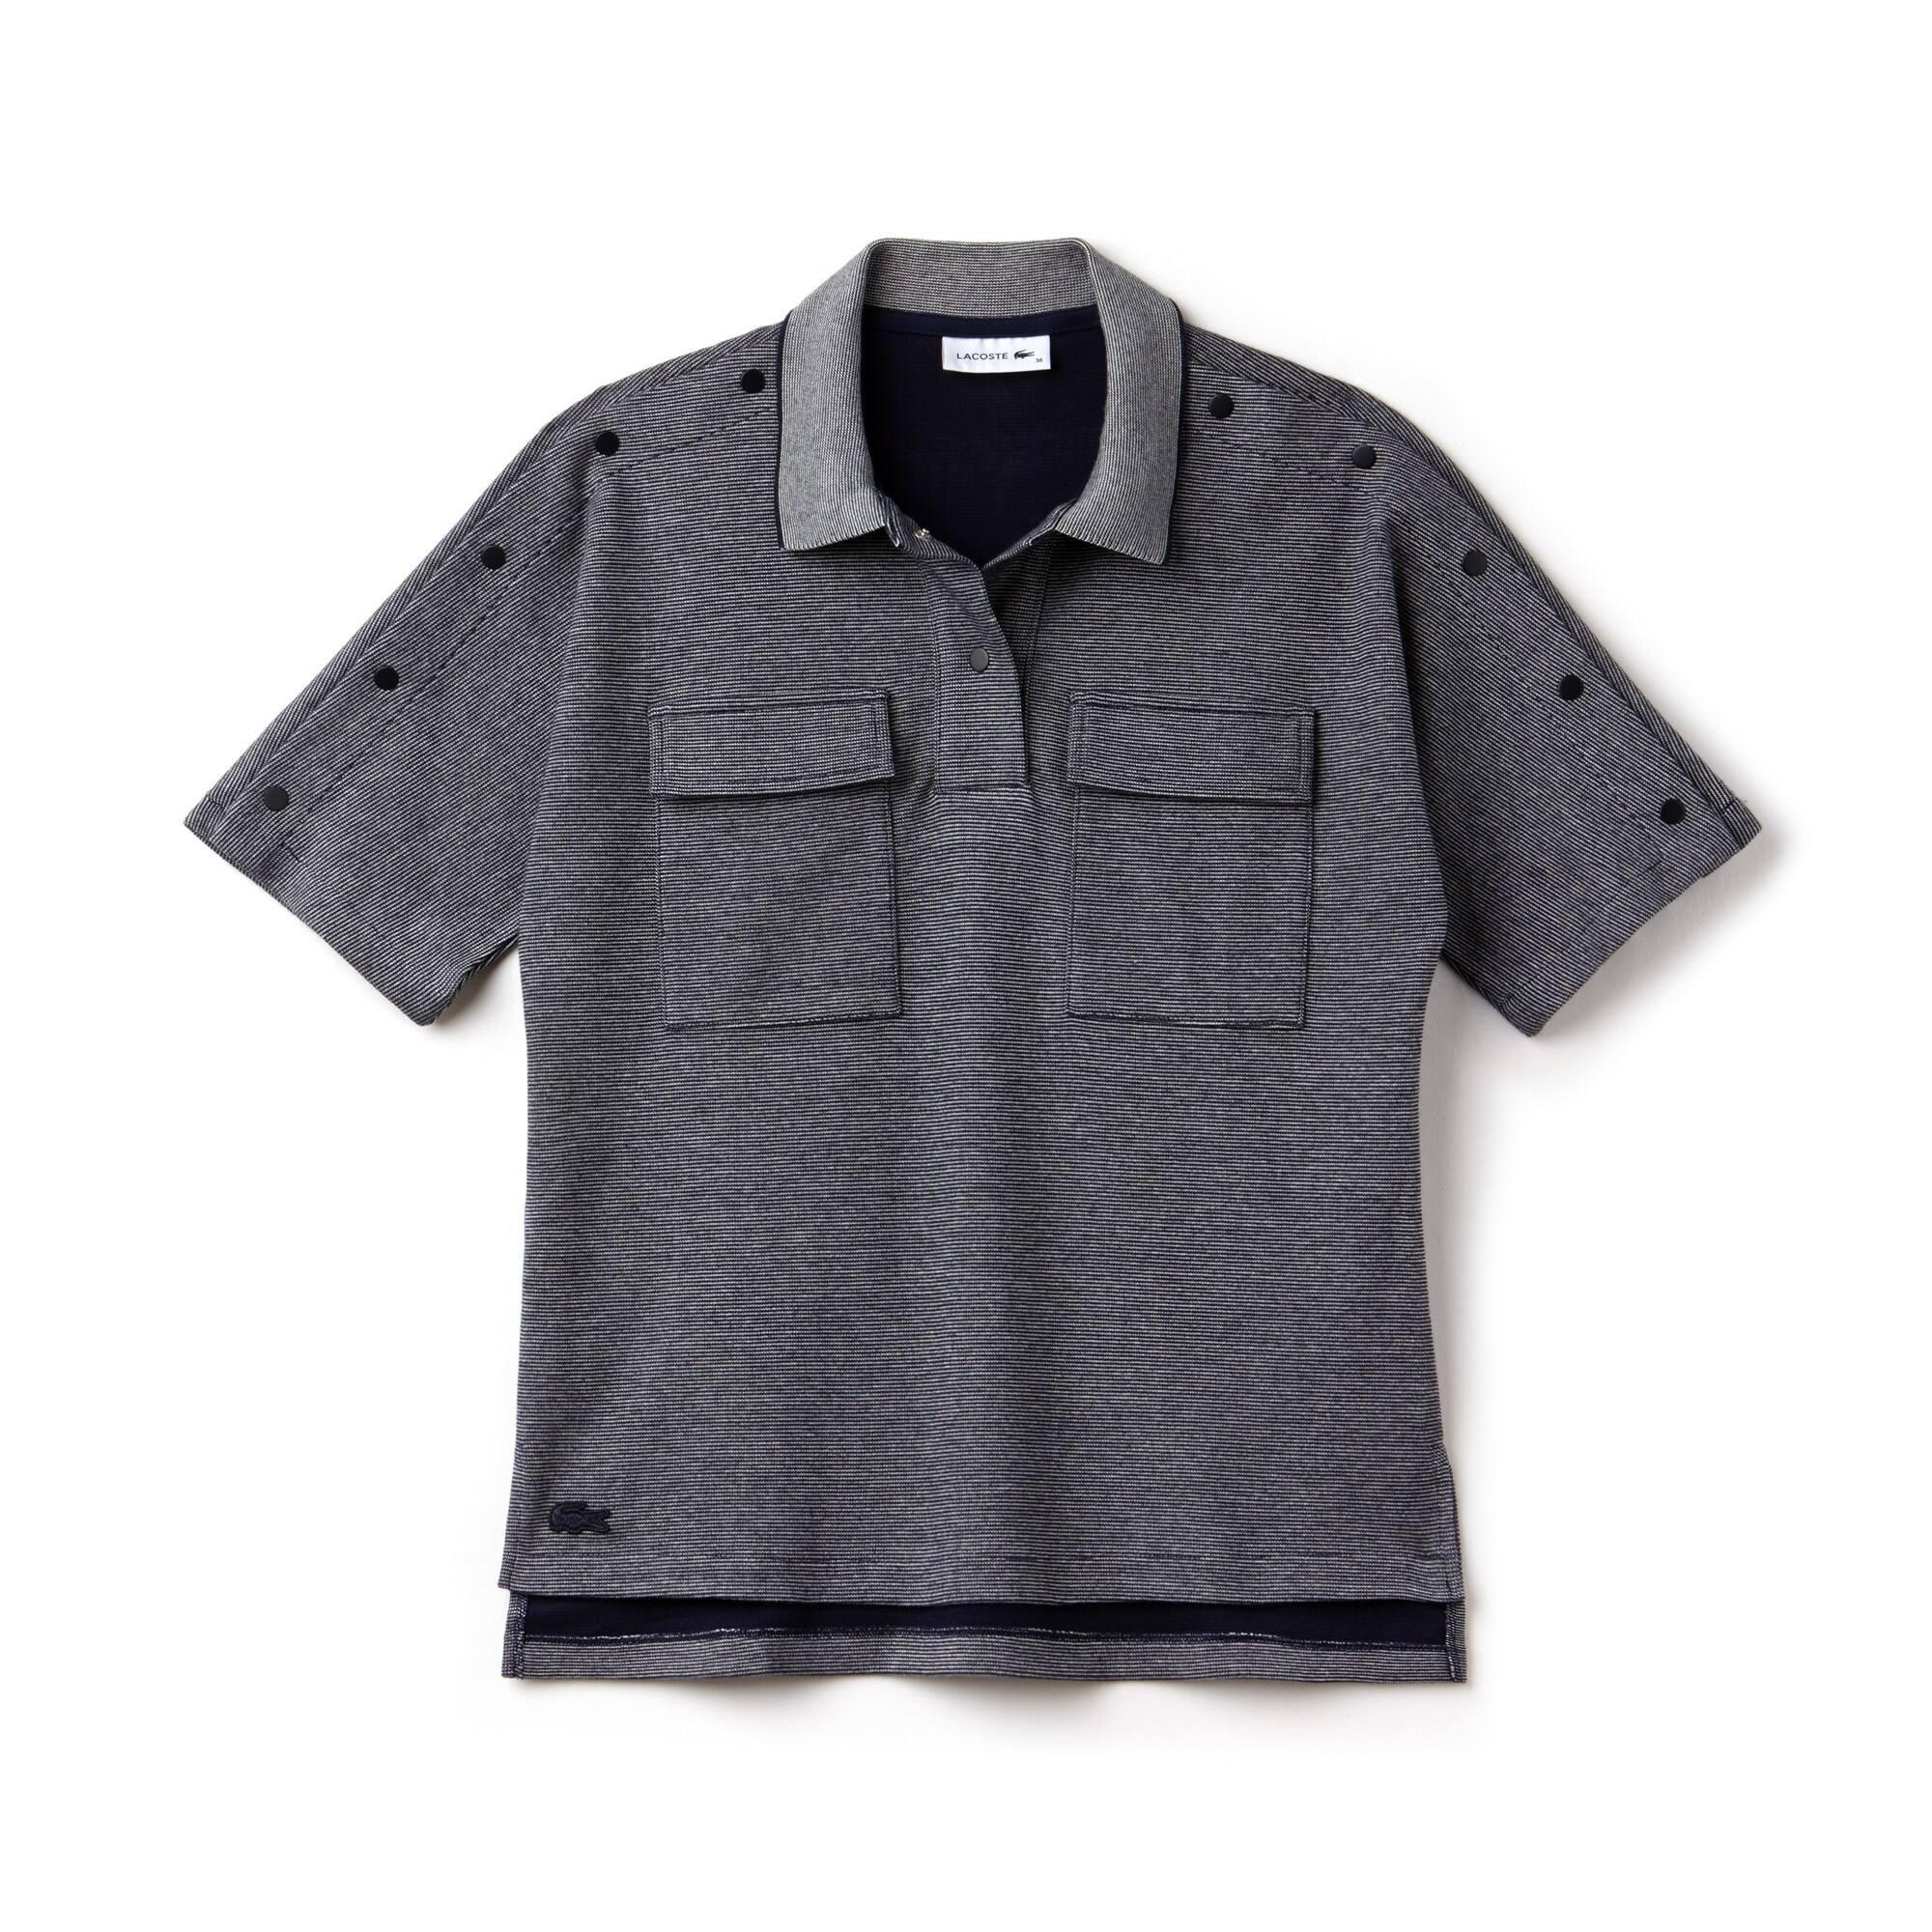 Women's Lacoste Buttoned Pinstriped Piqué Polo Shirt